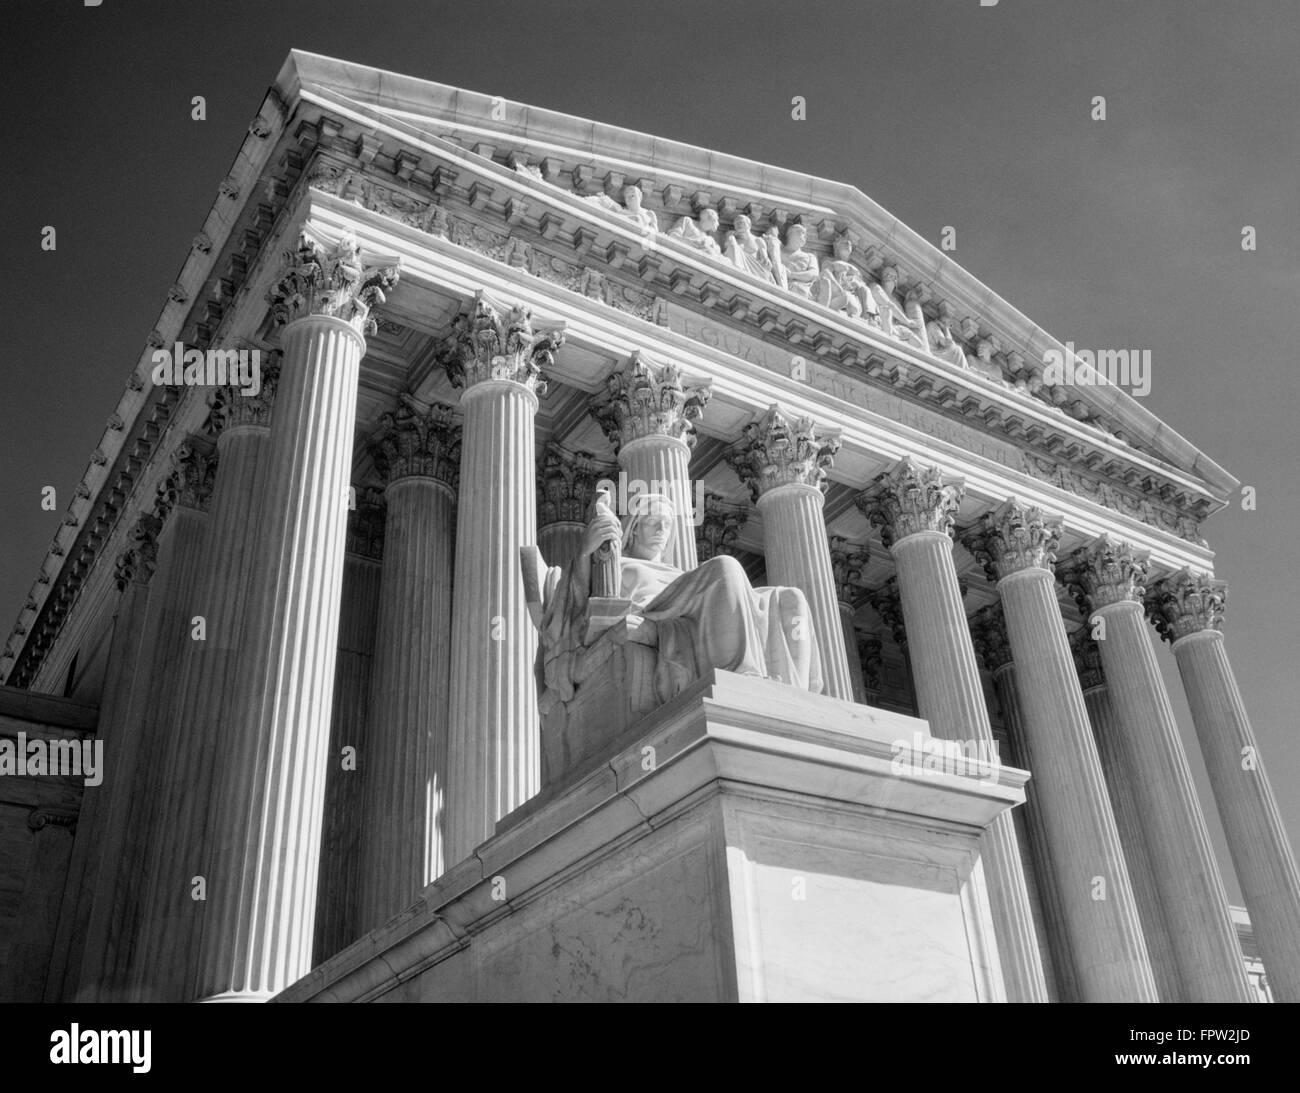 1980s FEDERAL SUPREME COURT BUILDING LOW ANGLE FRONT SHOT WASHINGTON DC USA - Stock Image